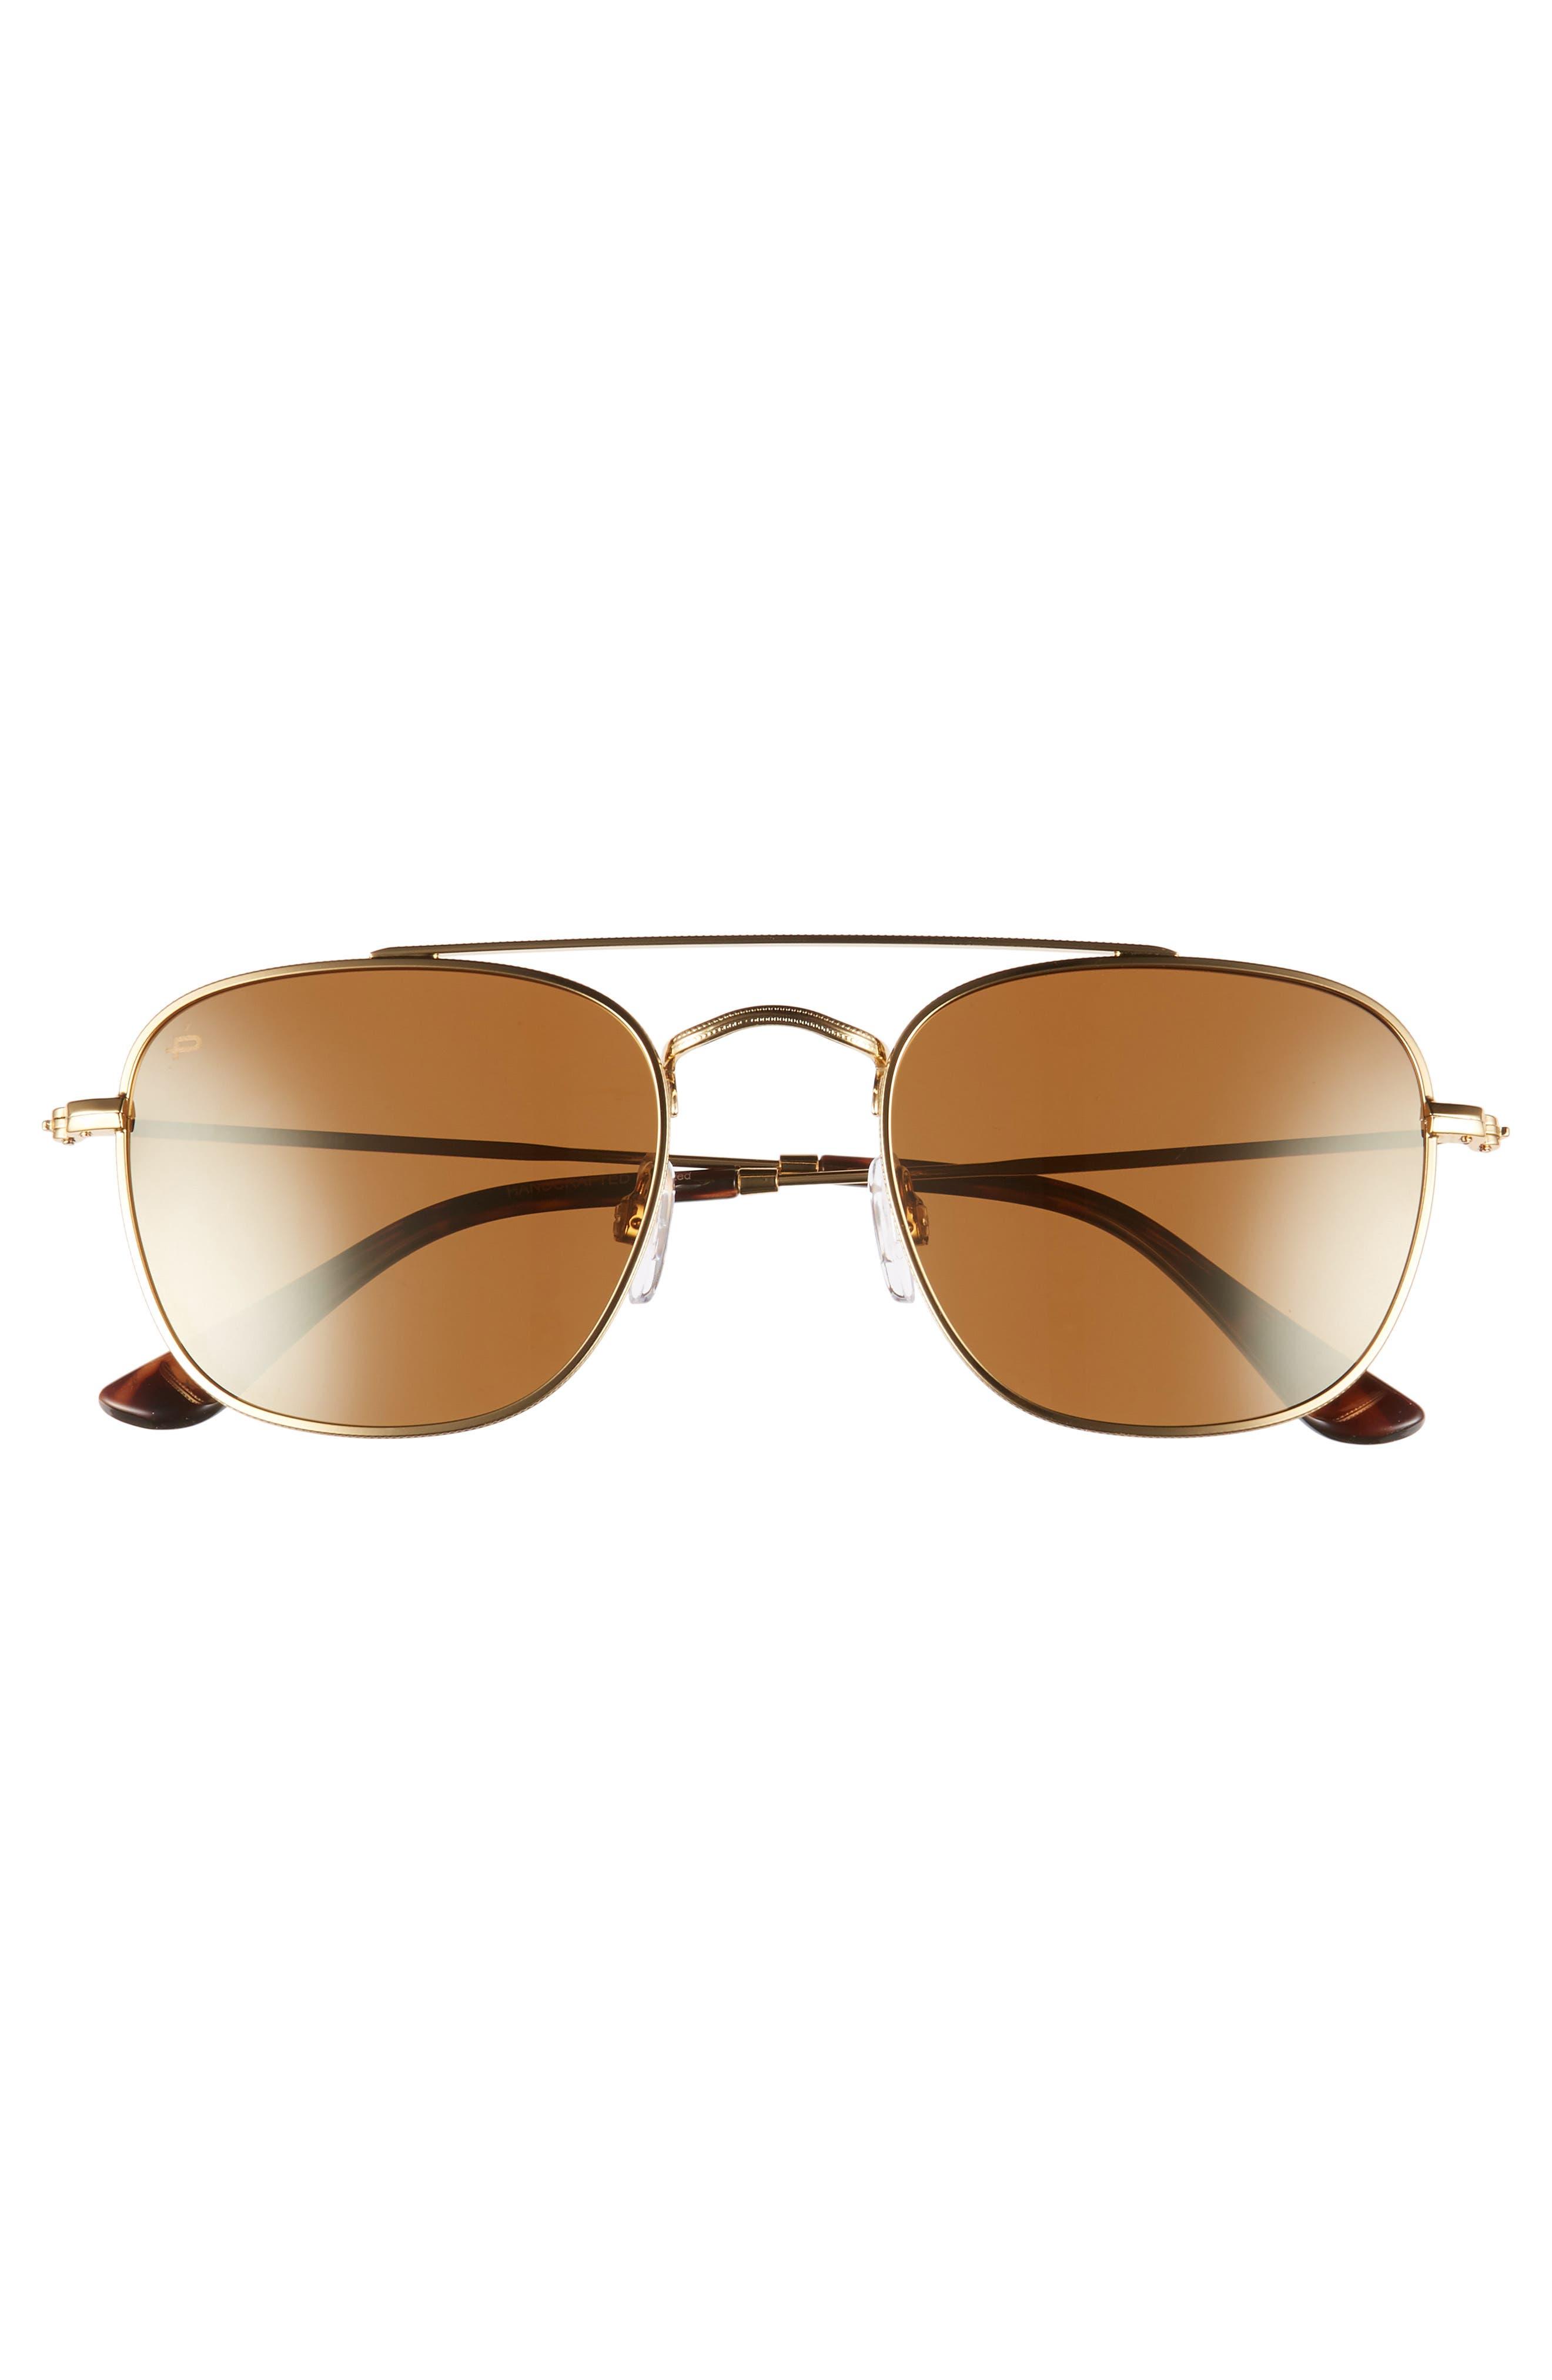 Privé Revaux The Yorker 54mm Sunglasses,                             Alternate thumbnail 3, color,                             HEAVY GOLD